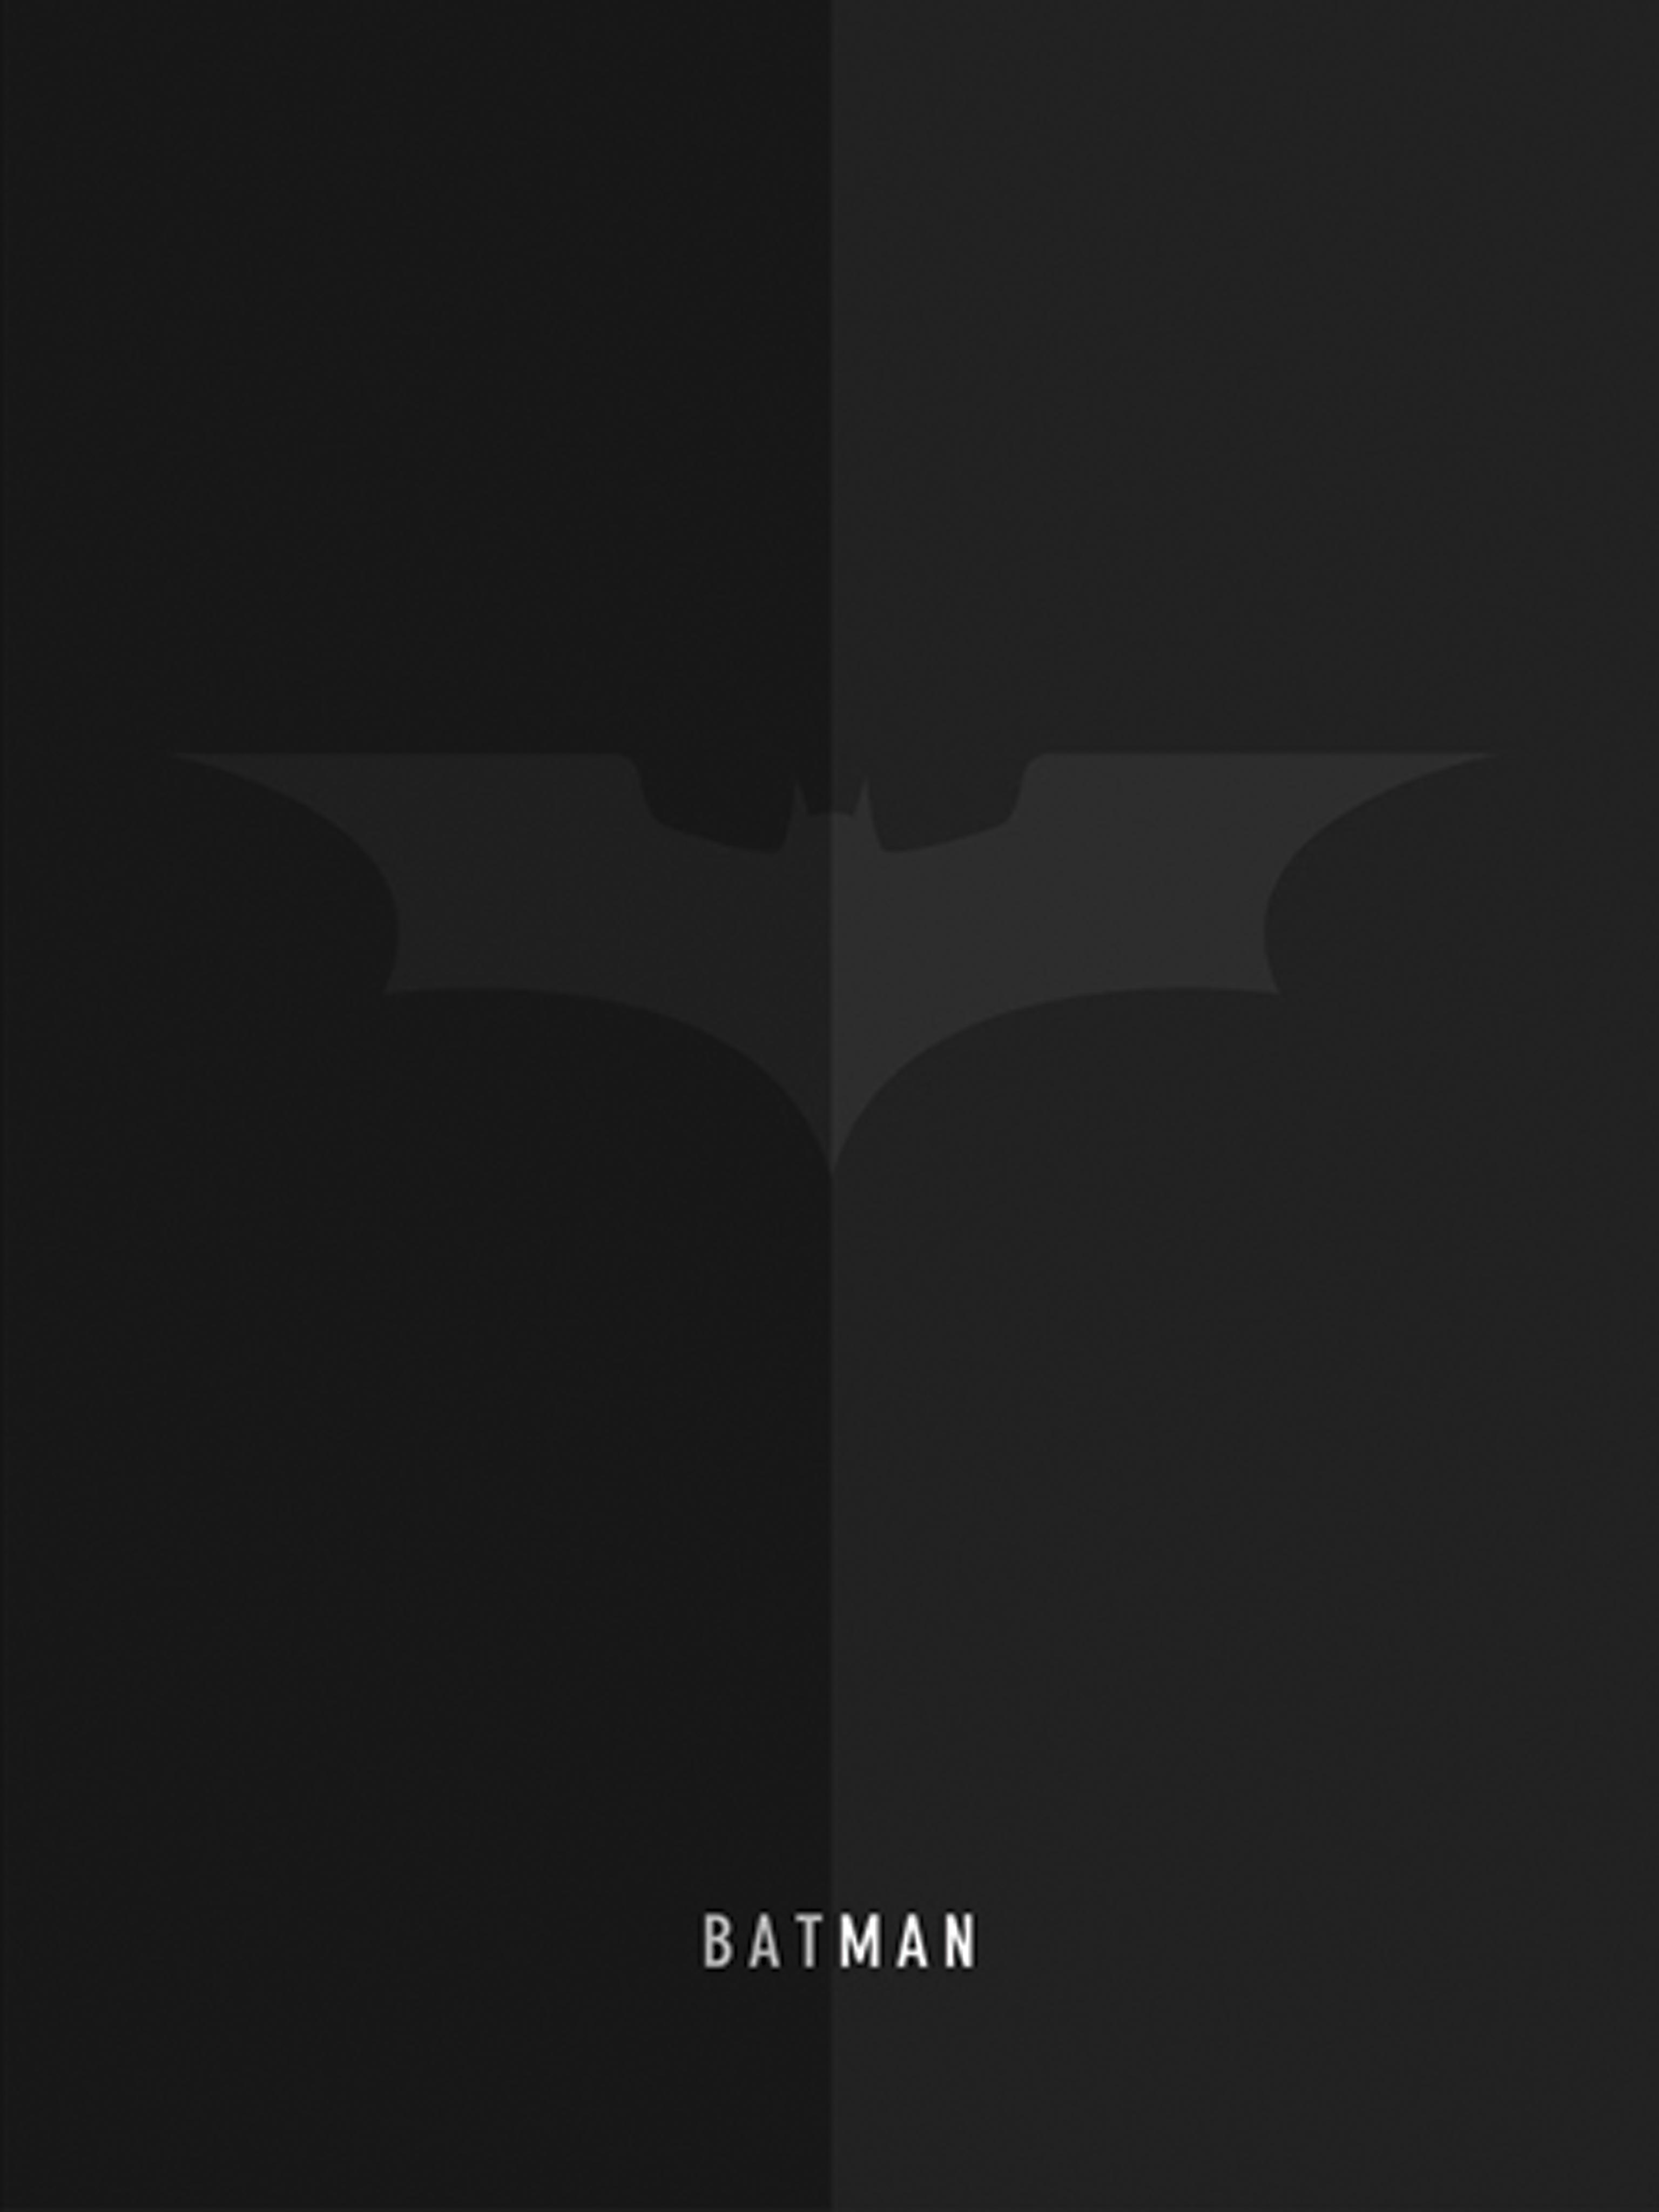 Batman Mobile Wallpaper | Miniwallist